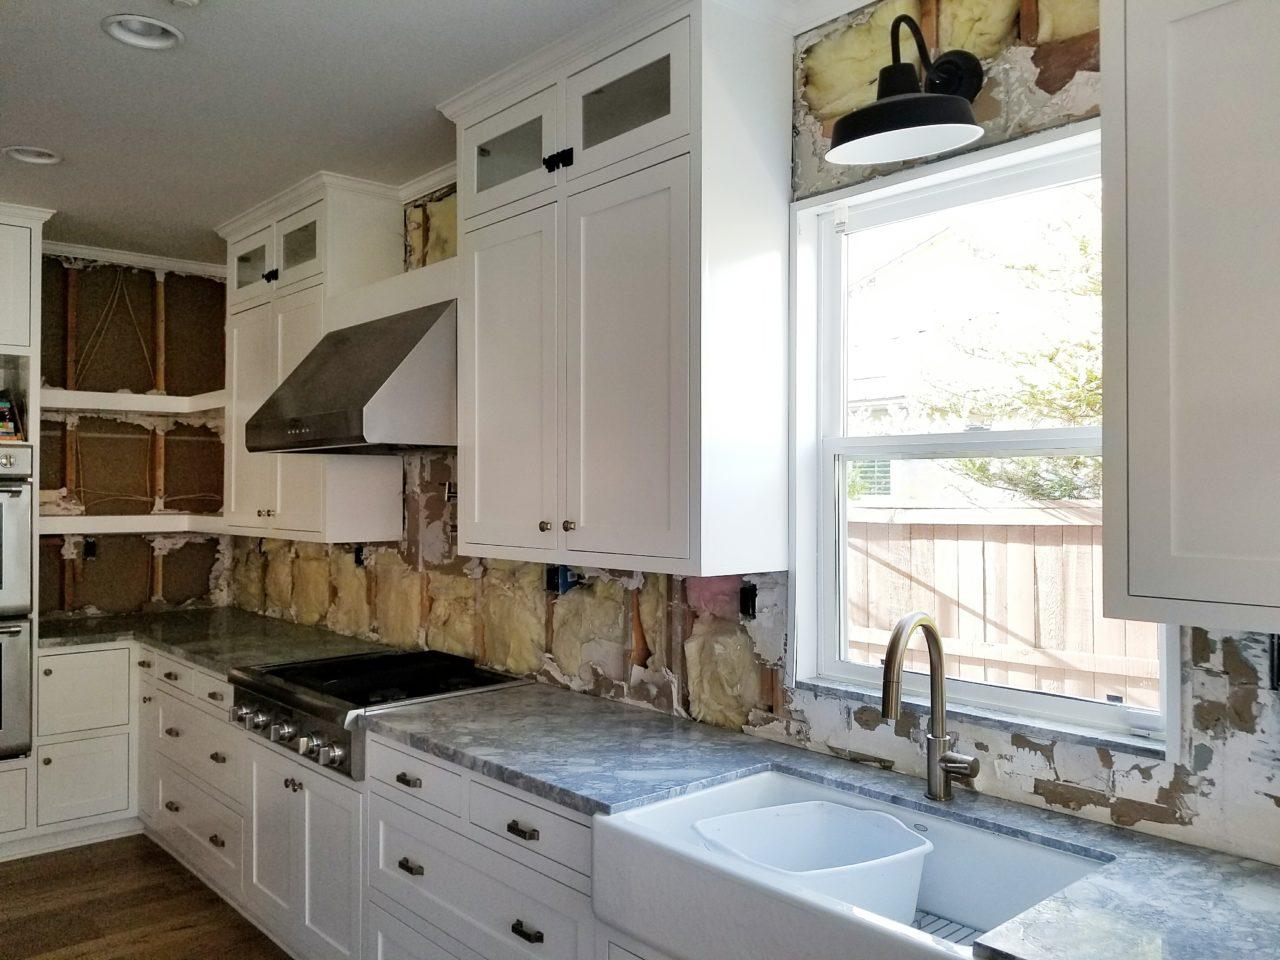 Kitchen Backsplash Installation With Floor Decor House Becomes Home Interiors